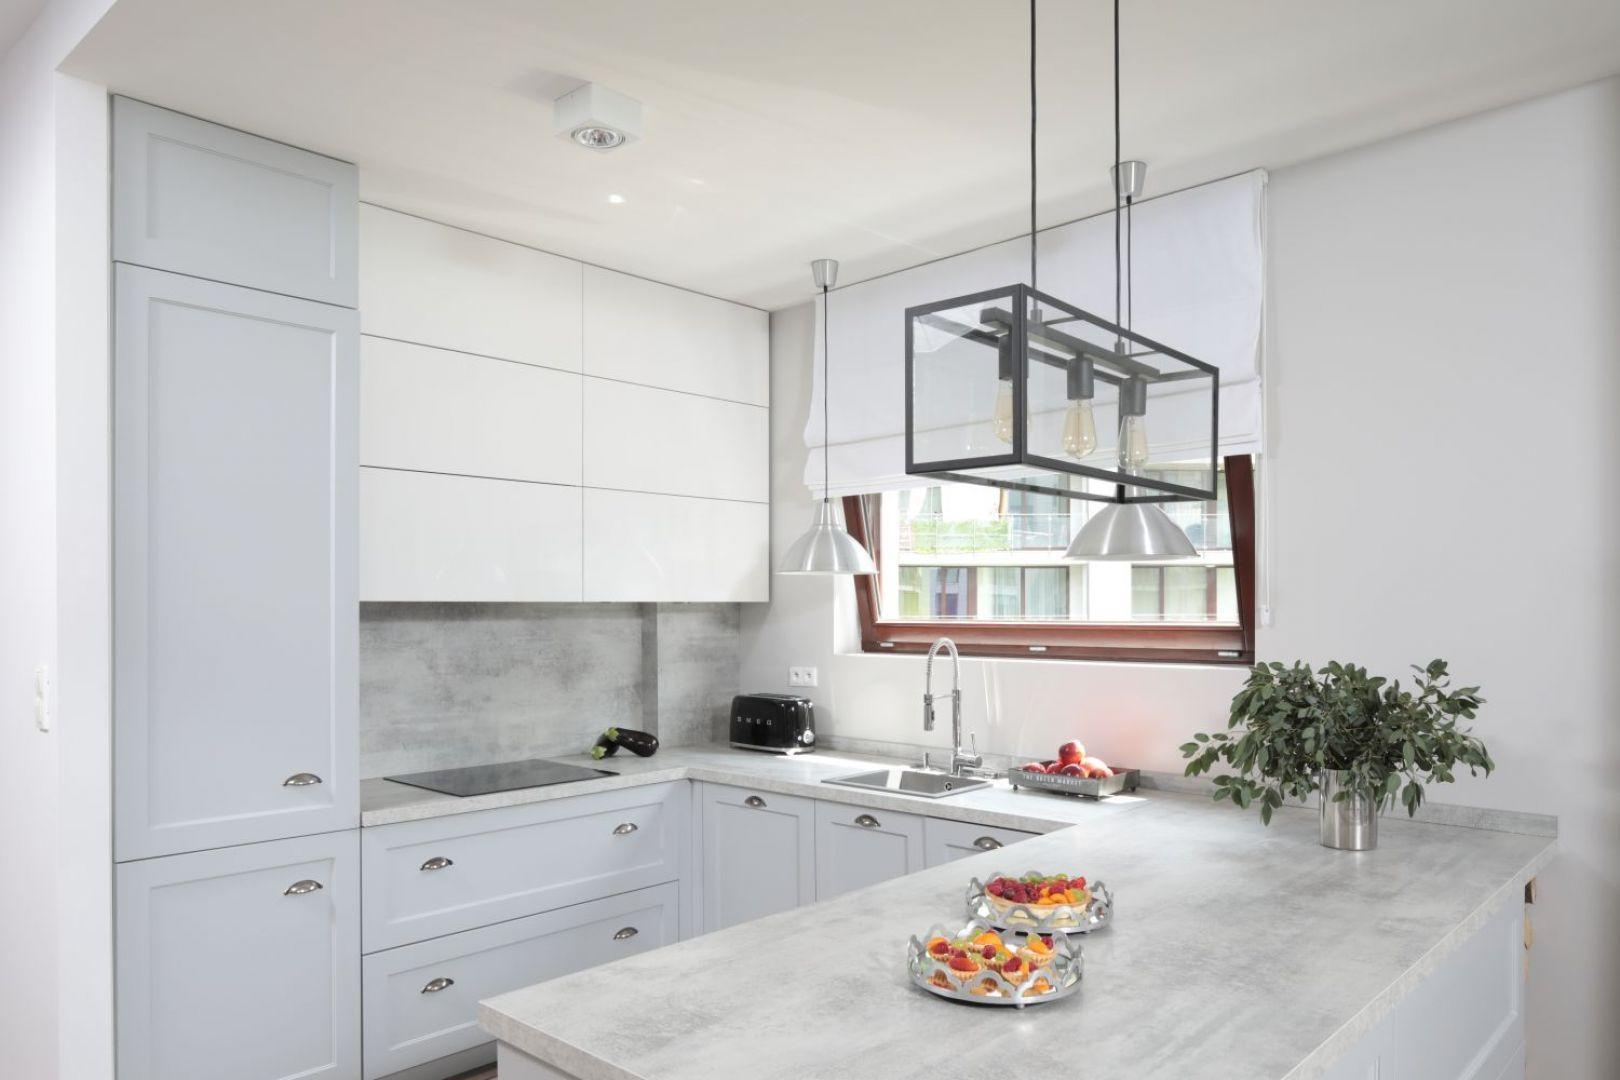 Klasyczna Kuchnia W Amerykanskim Stylu Projekt Wioleta Wojcik Maciuszek Konrad Maciuszek Fot Bartosz Jarosz Kitchen Styling Kitchen Design Kitchen